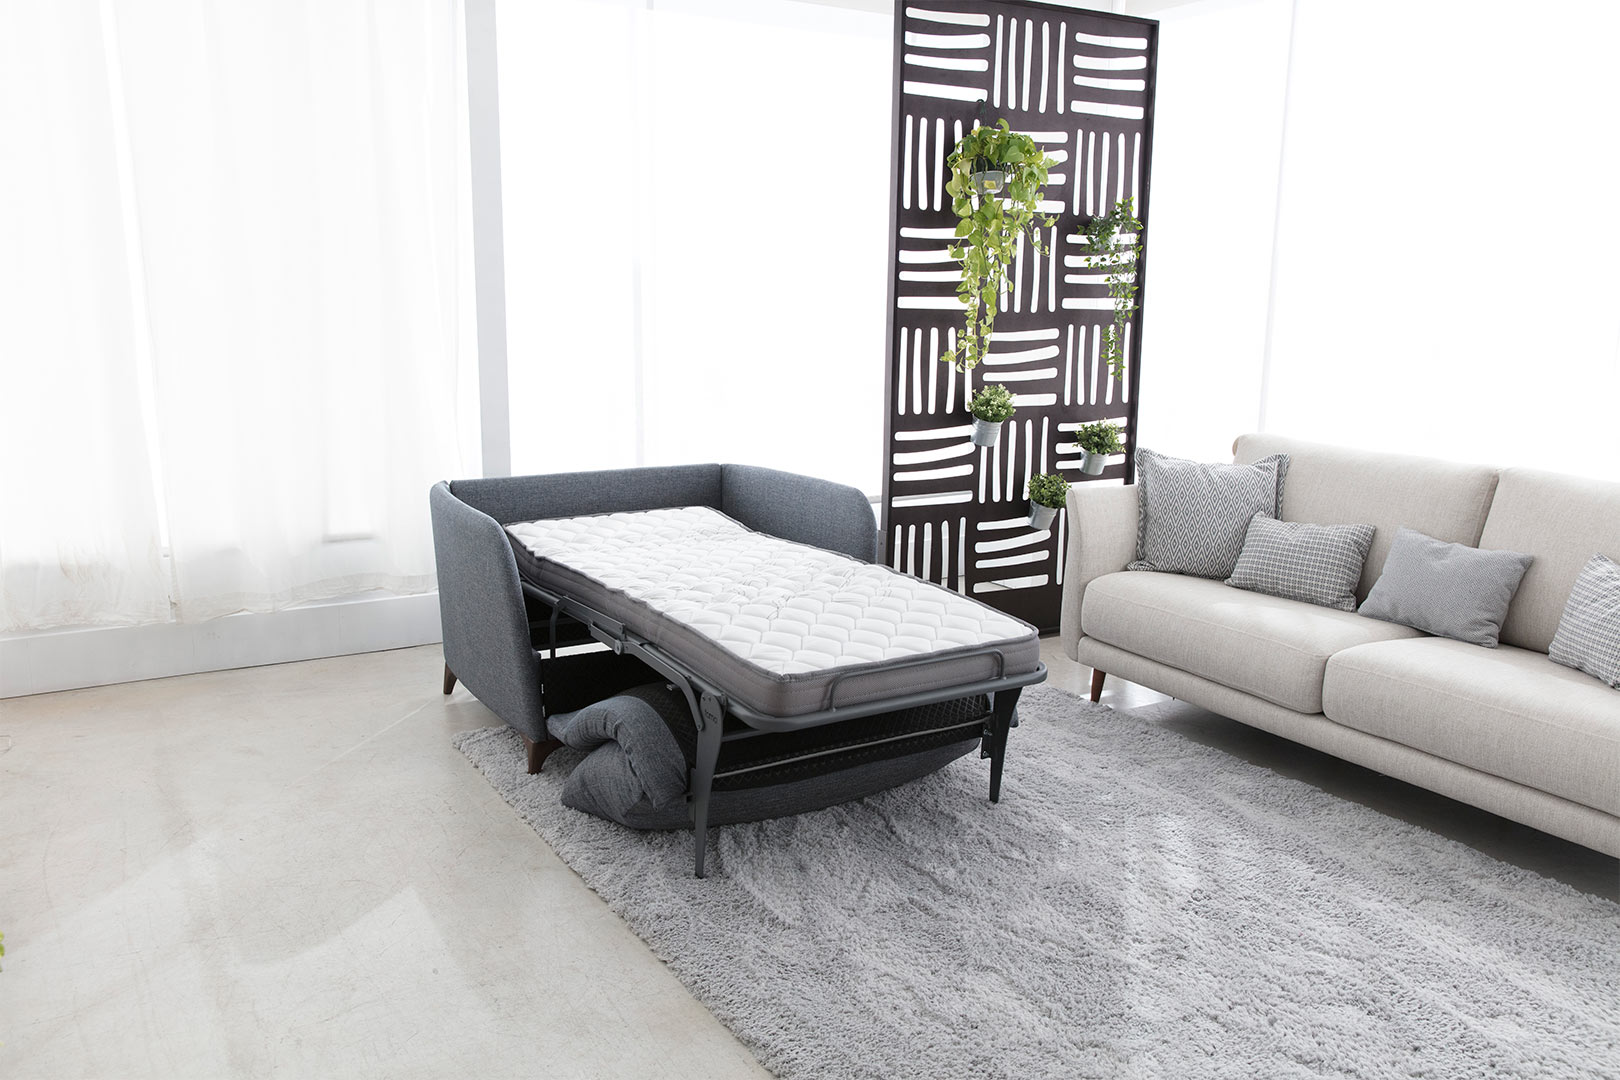 Gala sillón cama 2020 03